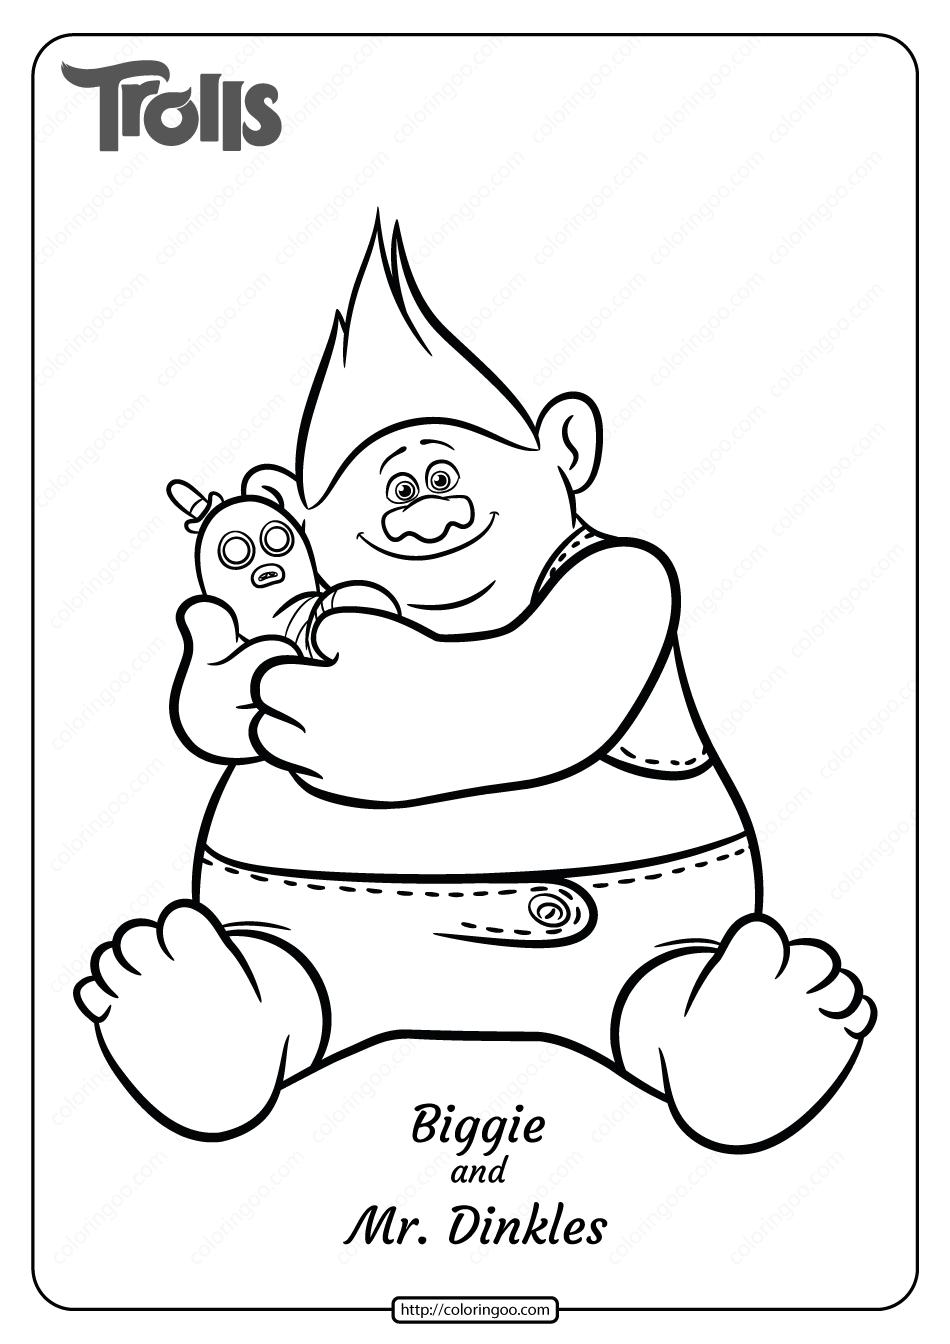 Free Printable Biggie And Mr Dinkles Coloring Page Coloring Pages Scary Coloring Pages Disney Coloring Pages